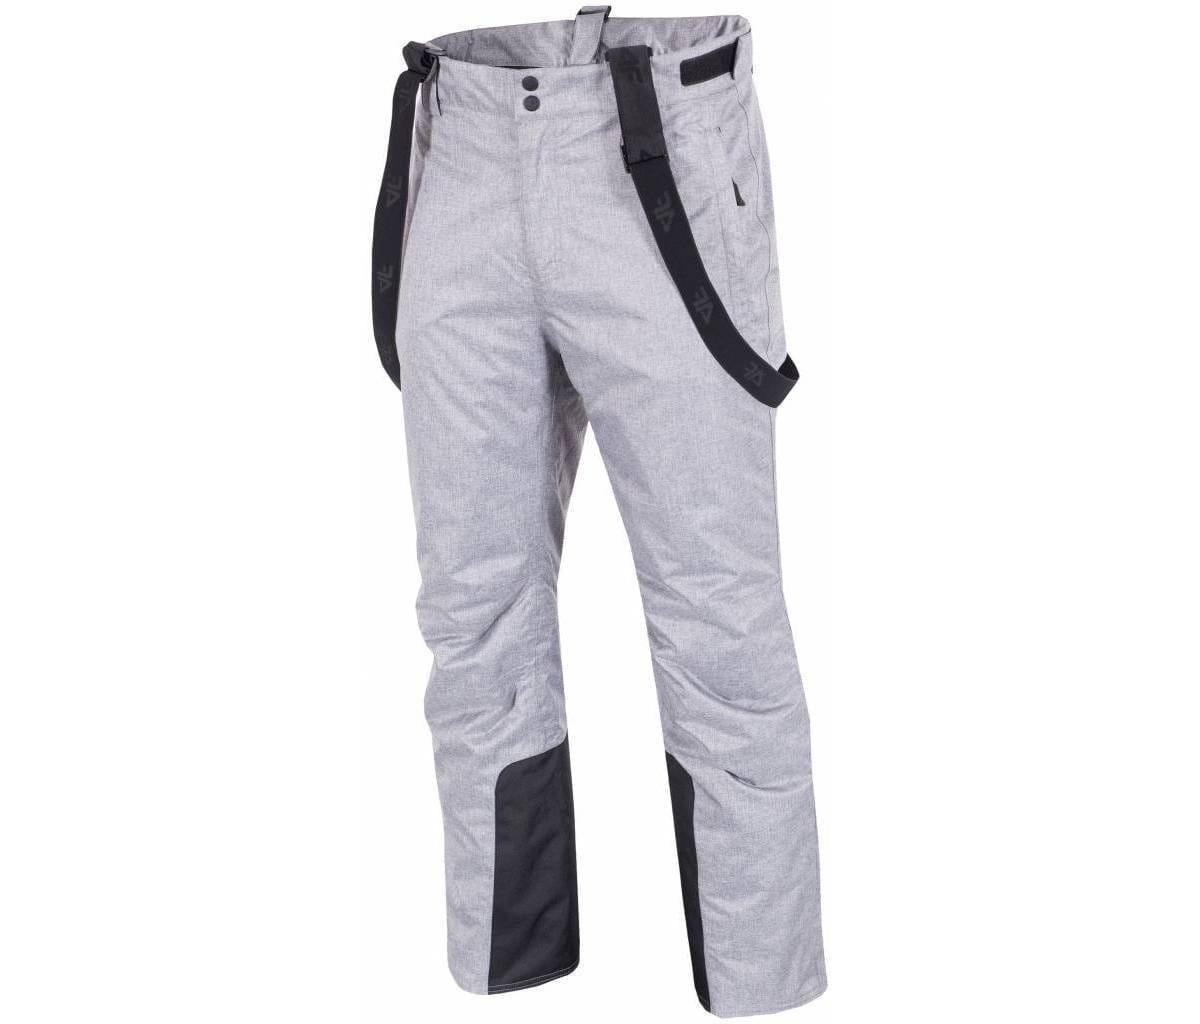 Kalhoty 4F Ski pants SPMN001